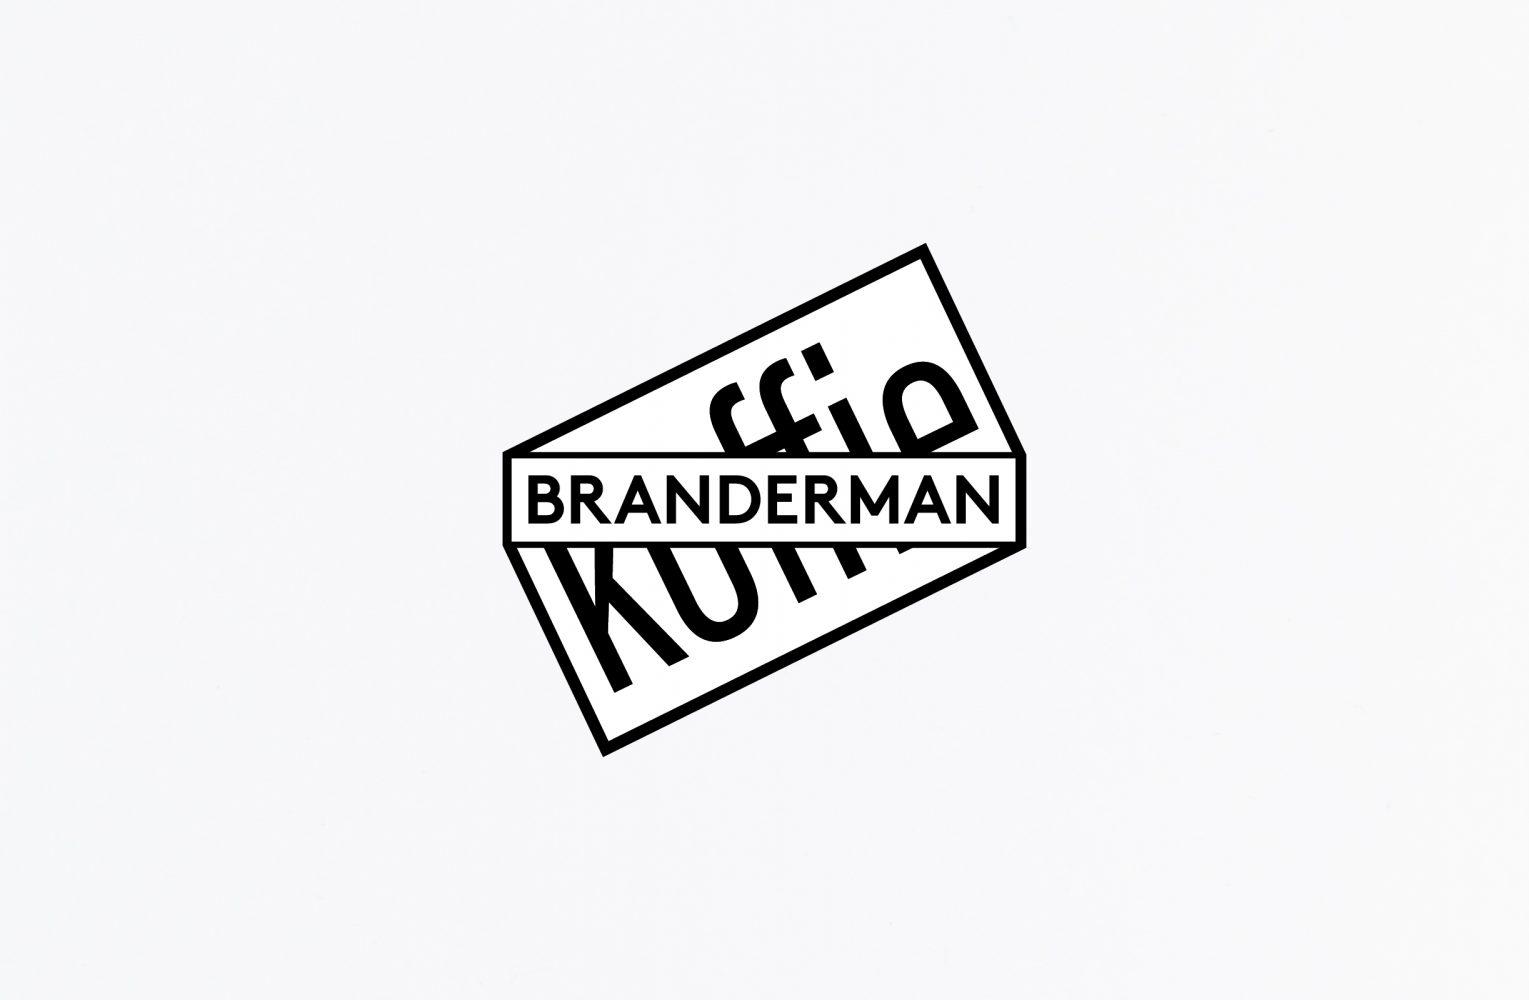 logo branderman